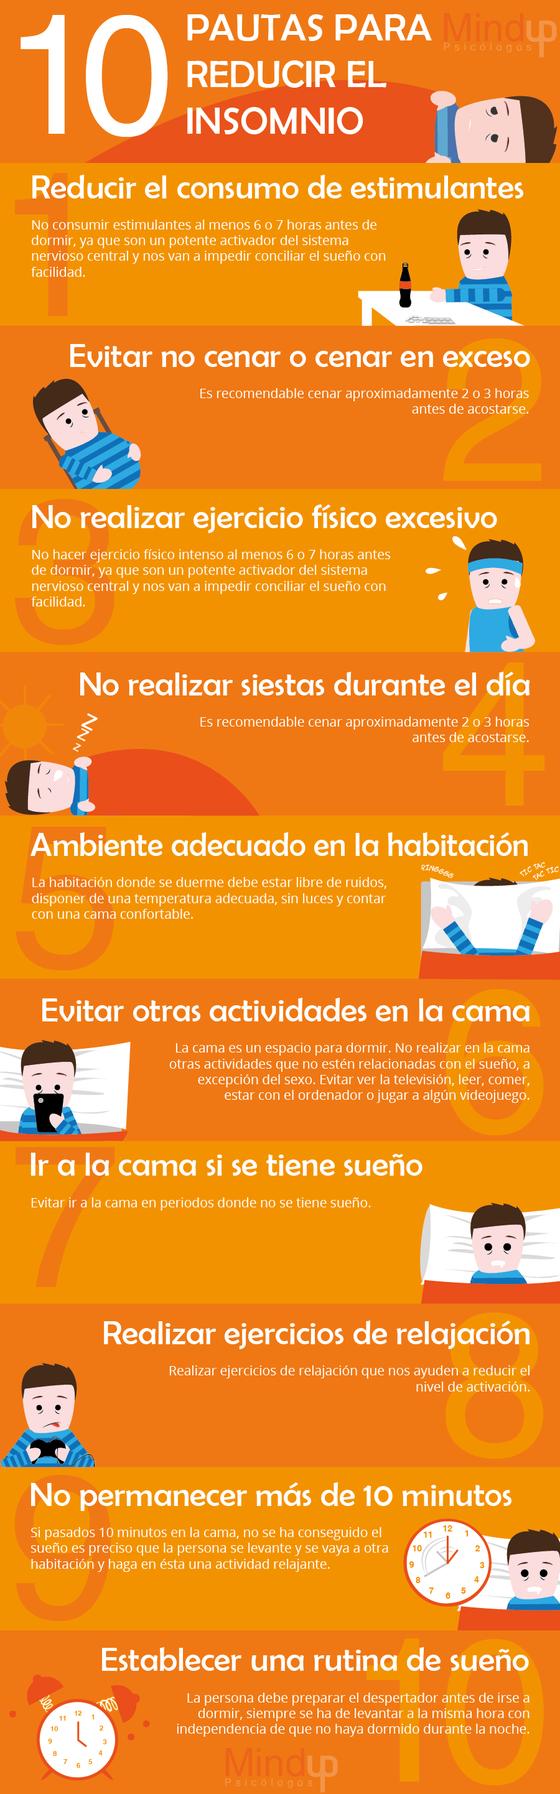 10-pautas-para-reducir-el-insomnio-infograficc81a-min